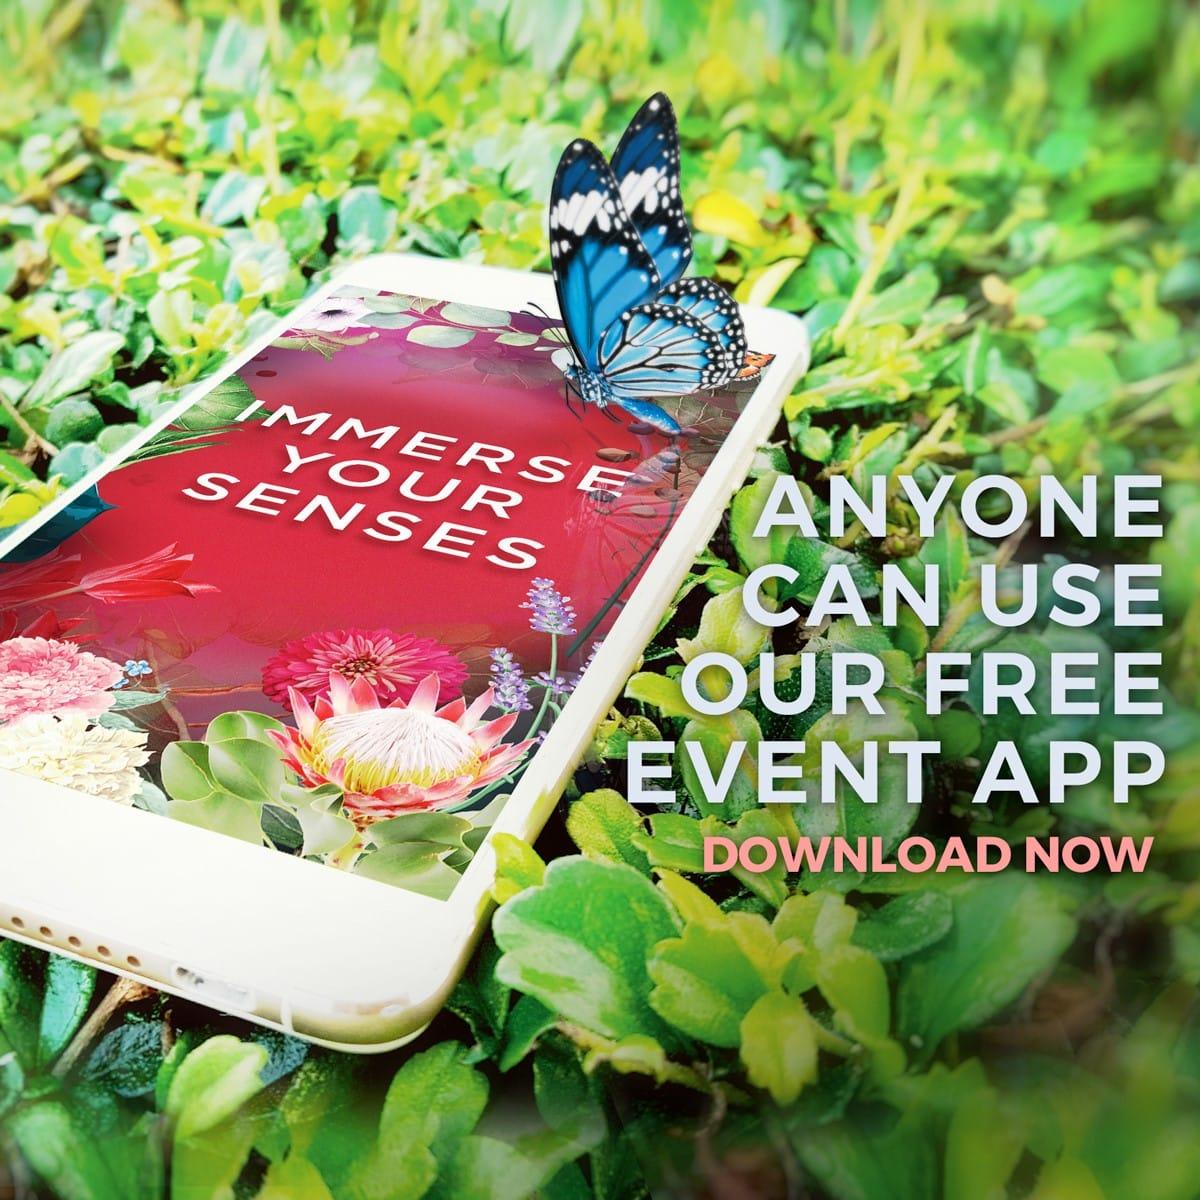 download the show app - melbourne international flower & garden show